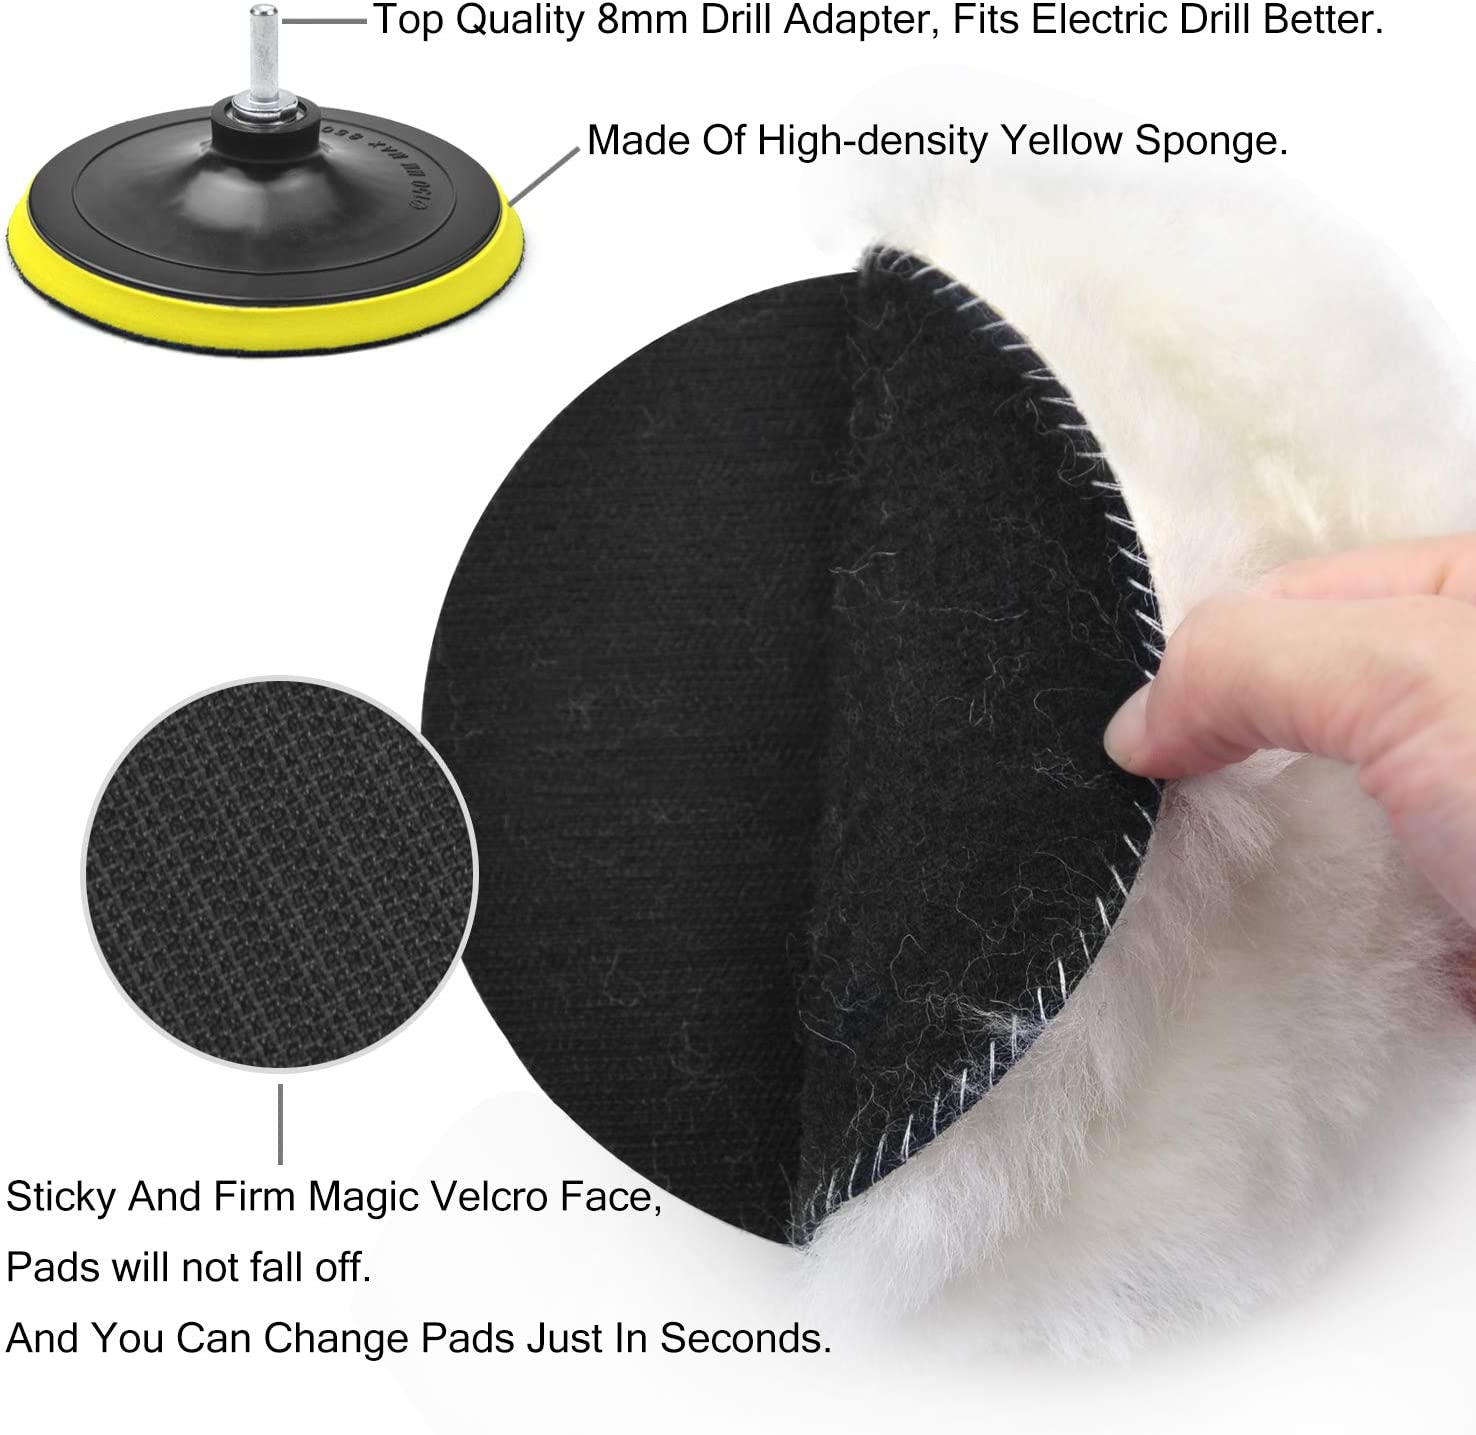 2pcs Soft Sponge Buffing Pads Total 10 Pack 4pcs Woolen Waxing Wheels 2pcs Car Polishing Bonnets with M14 Drill Adapter POLIWELL 6 Inch Wool Polishing Pad Kit